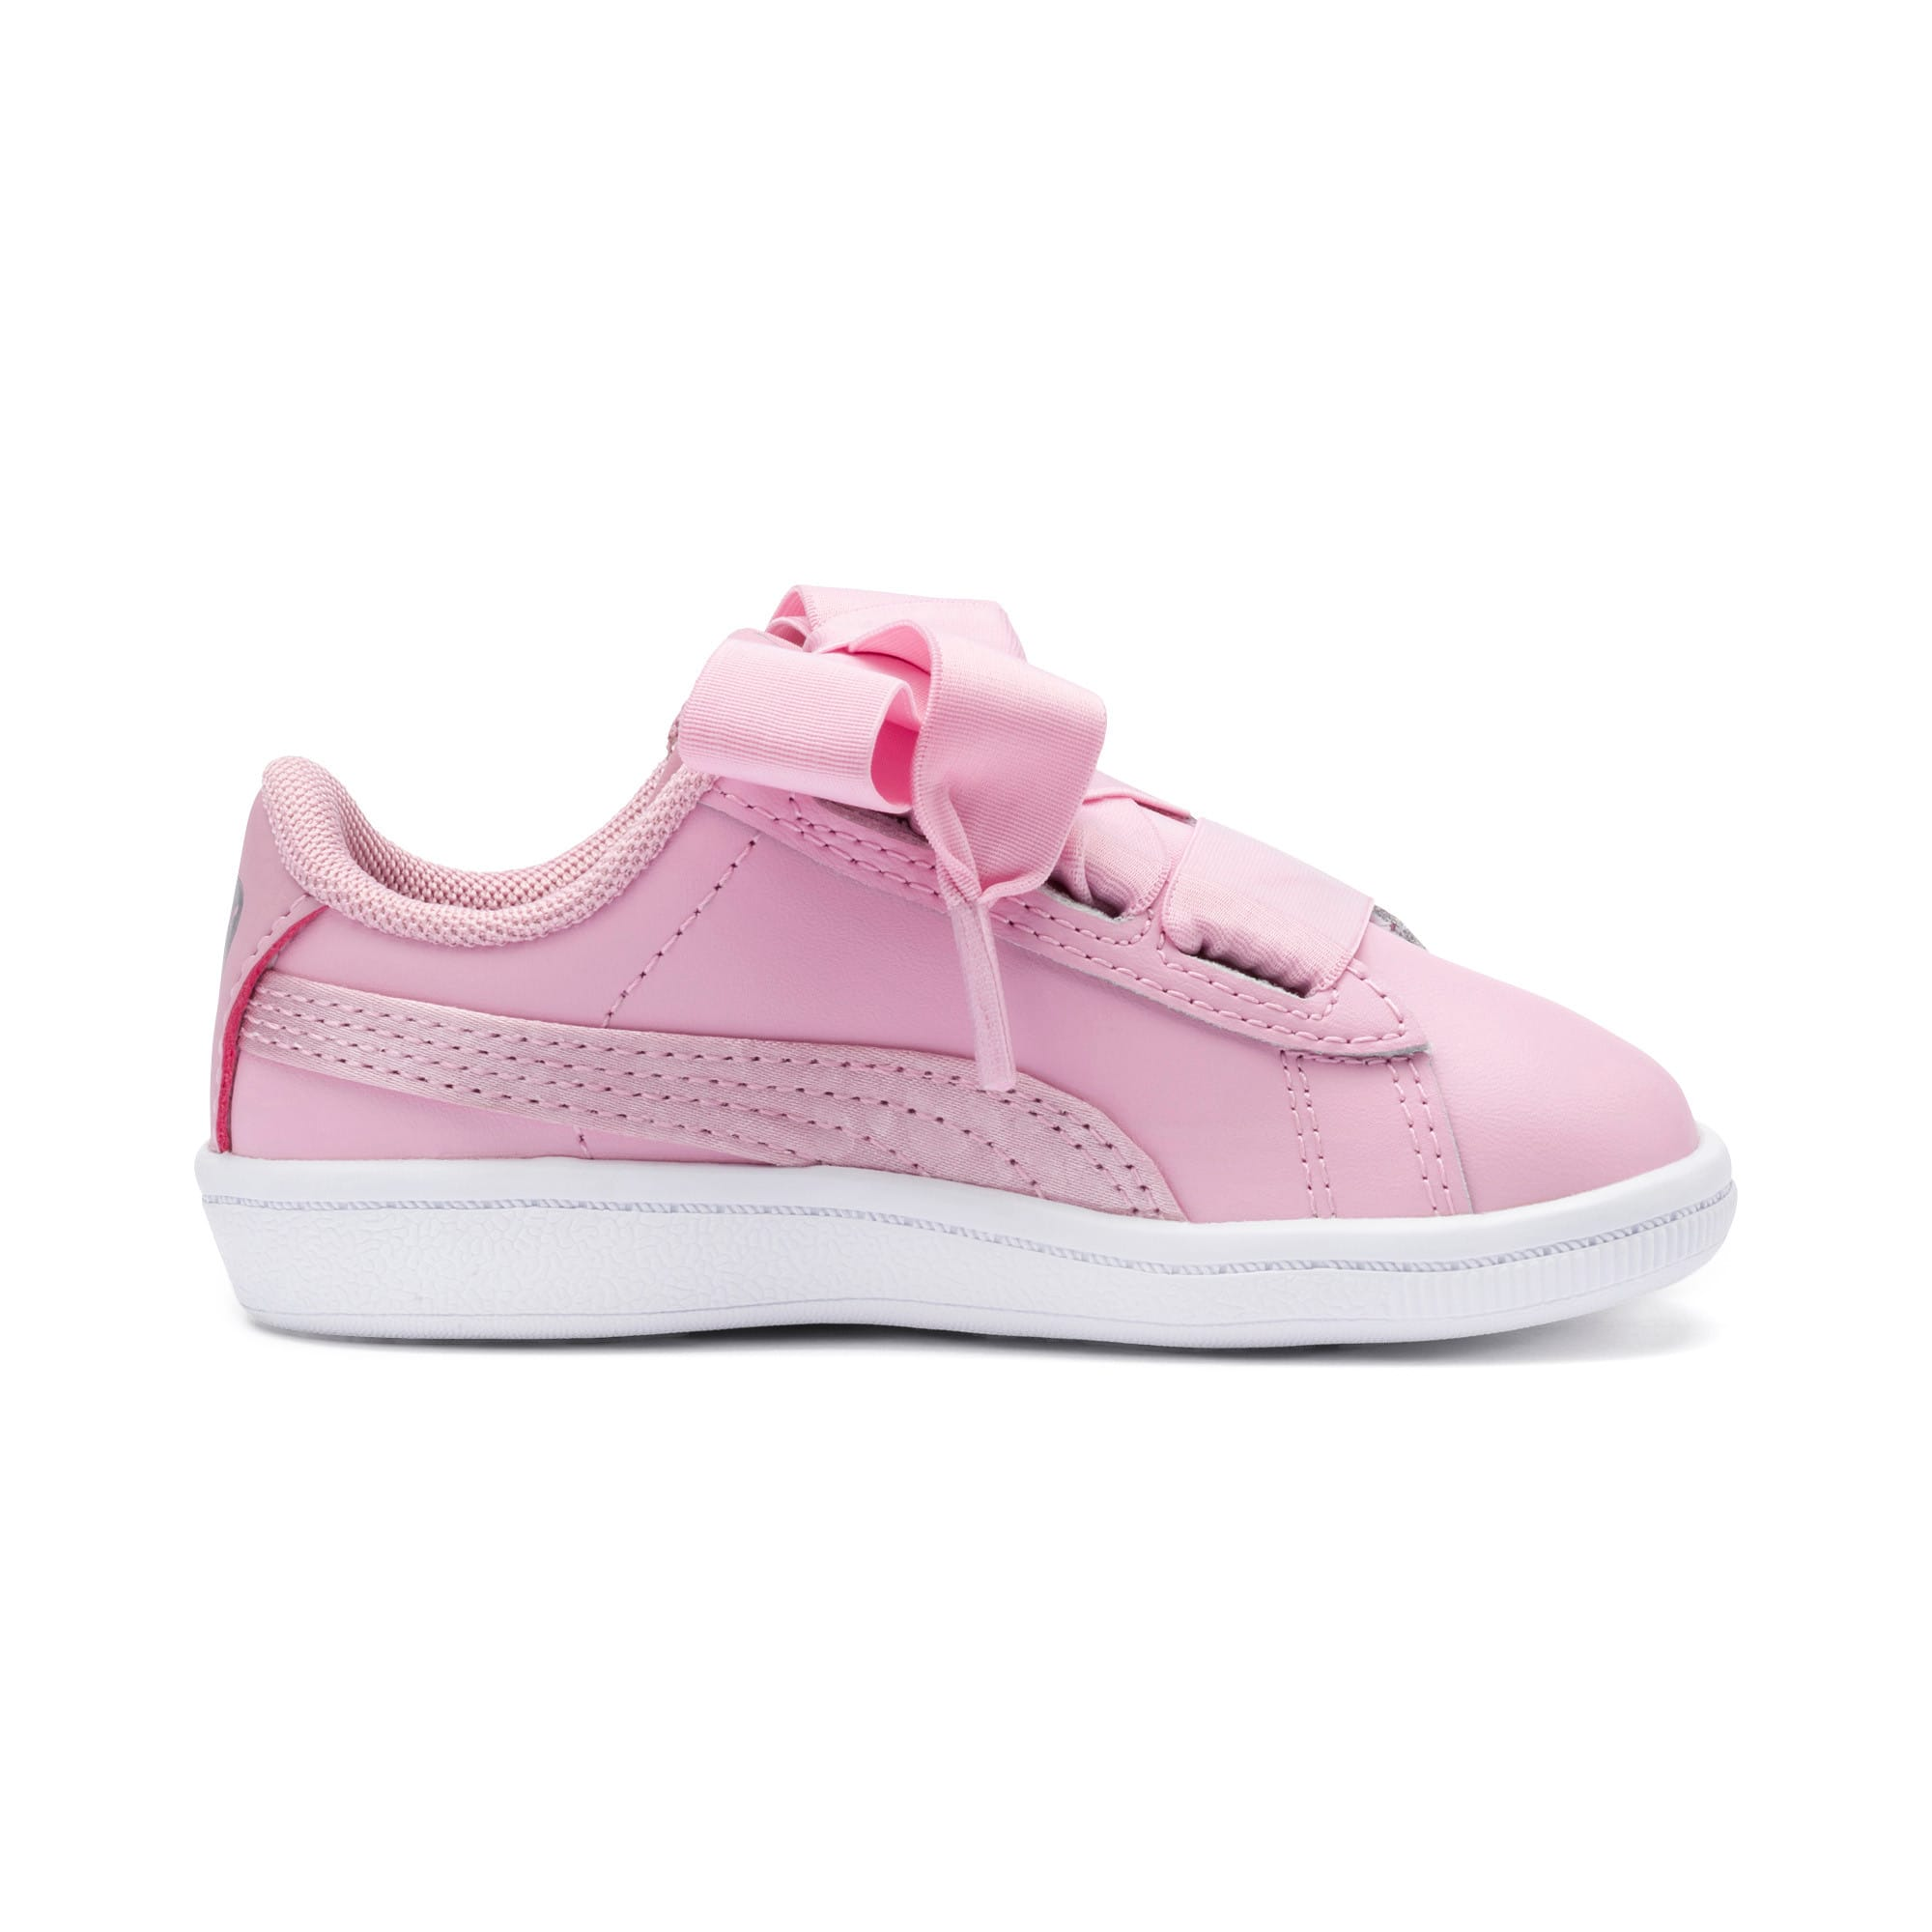 Miniatura 5 de ZapatosPUMA Vikky Ribbon Satin AC para niños, Pale Pink-Pale Pink, mediano